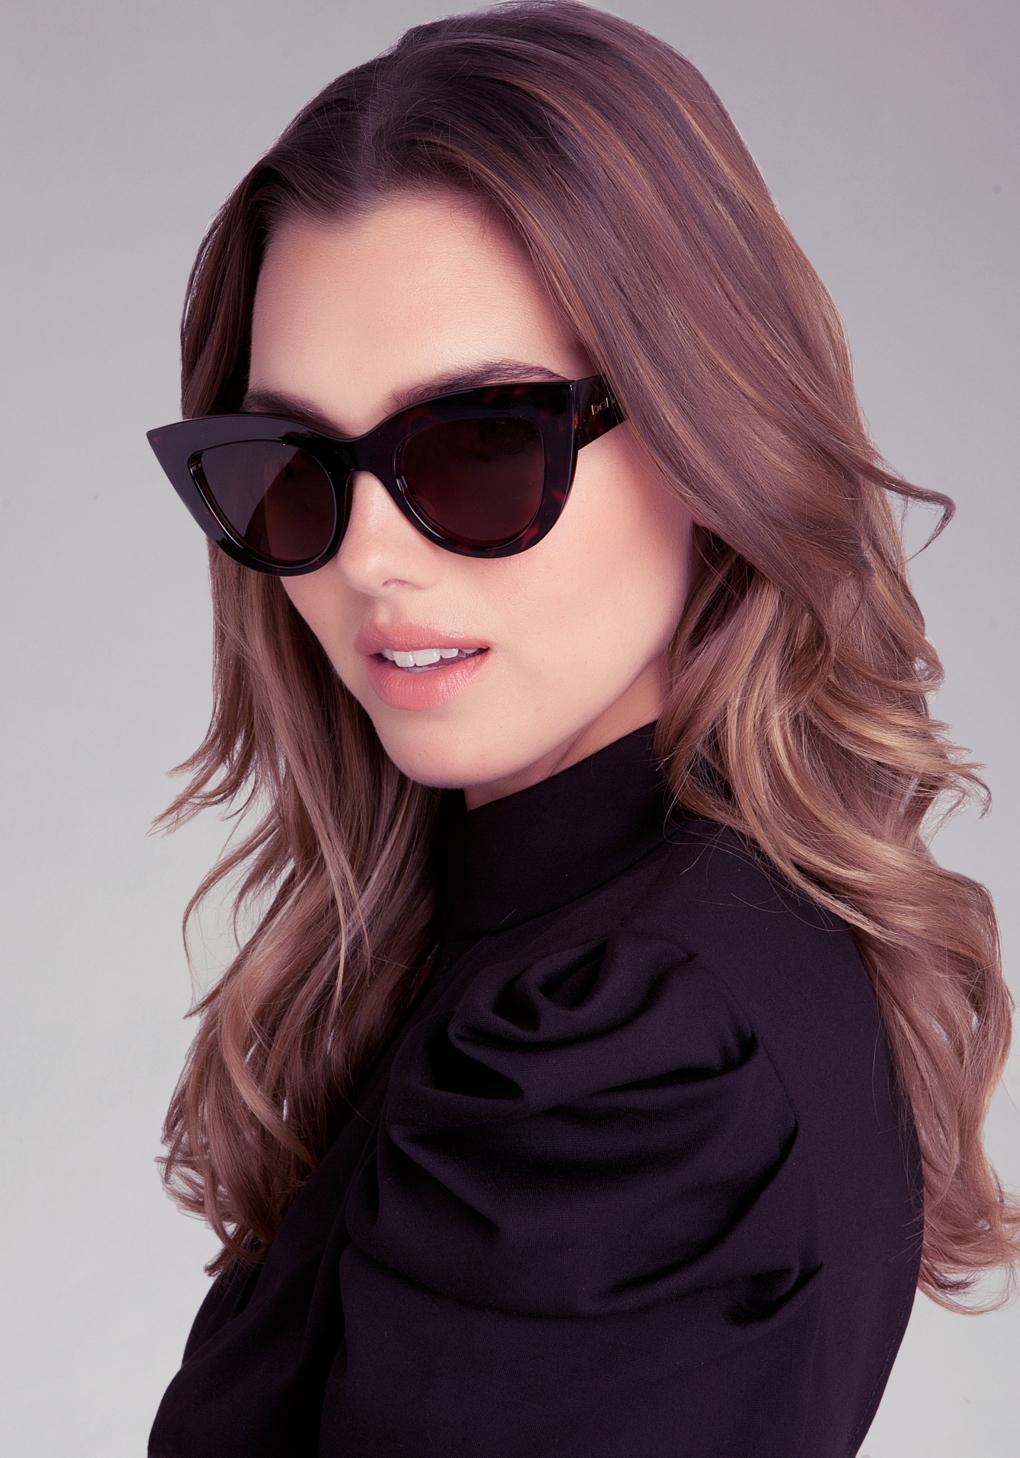 Impulse Sunglasses Bebe Red Eye Cat oWrCBdeQx